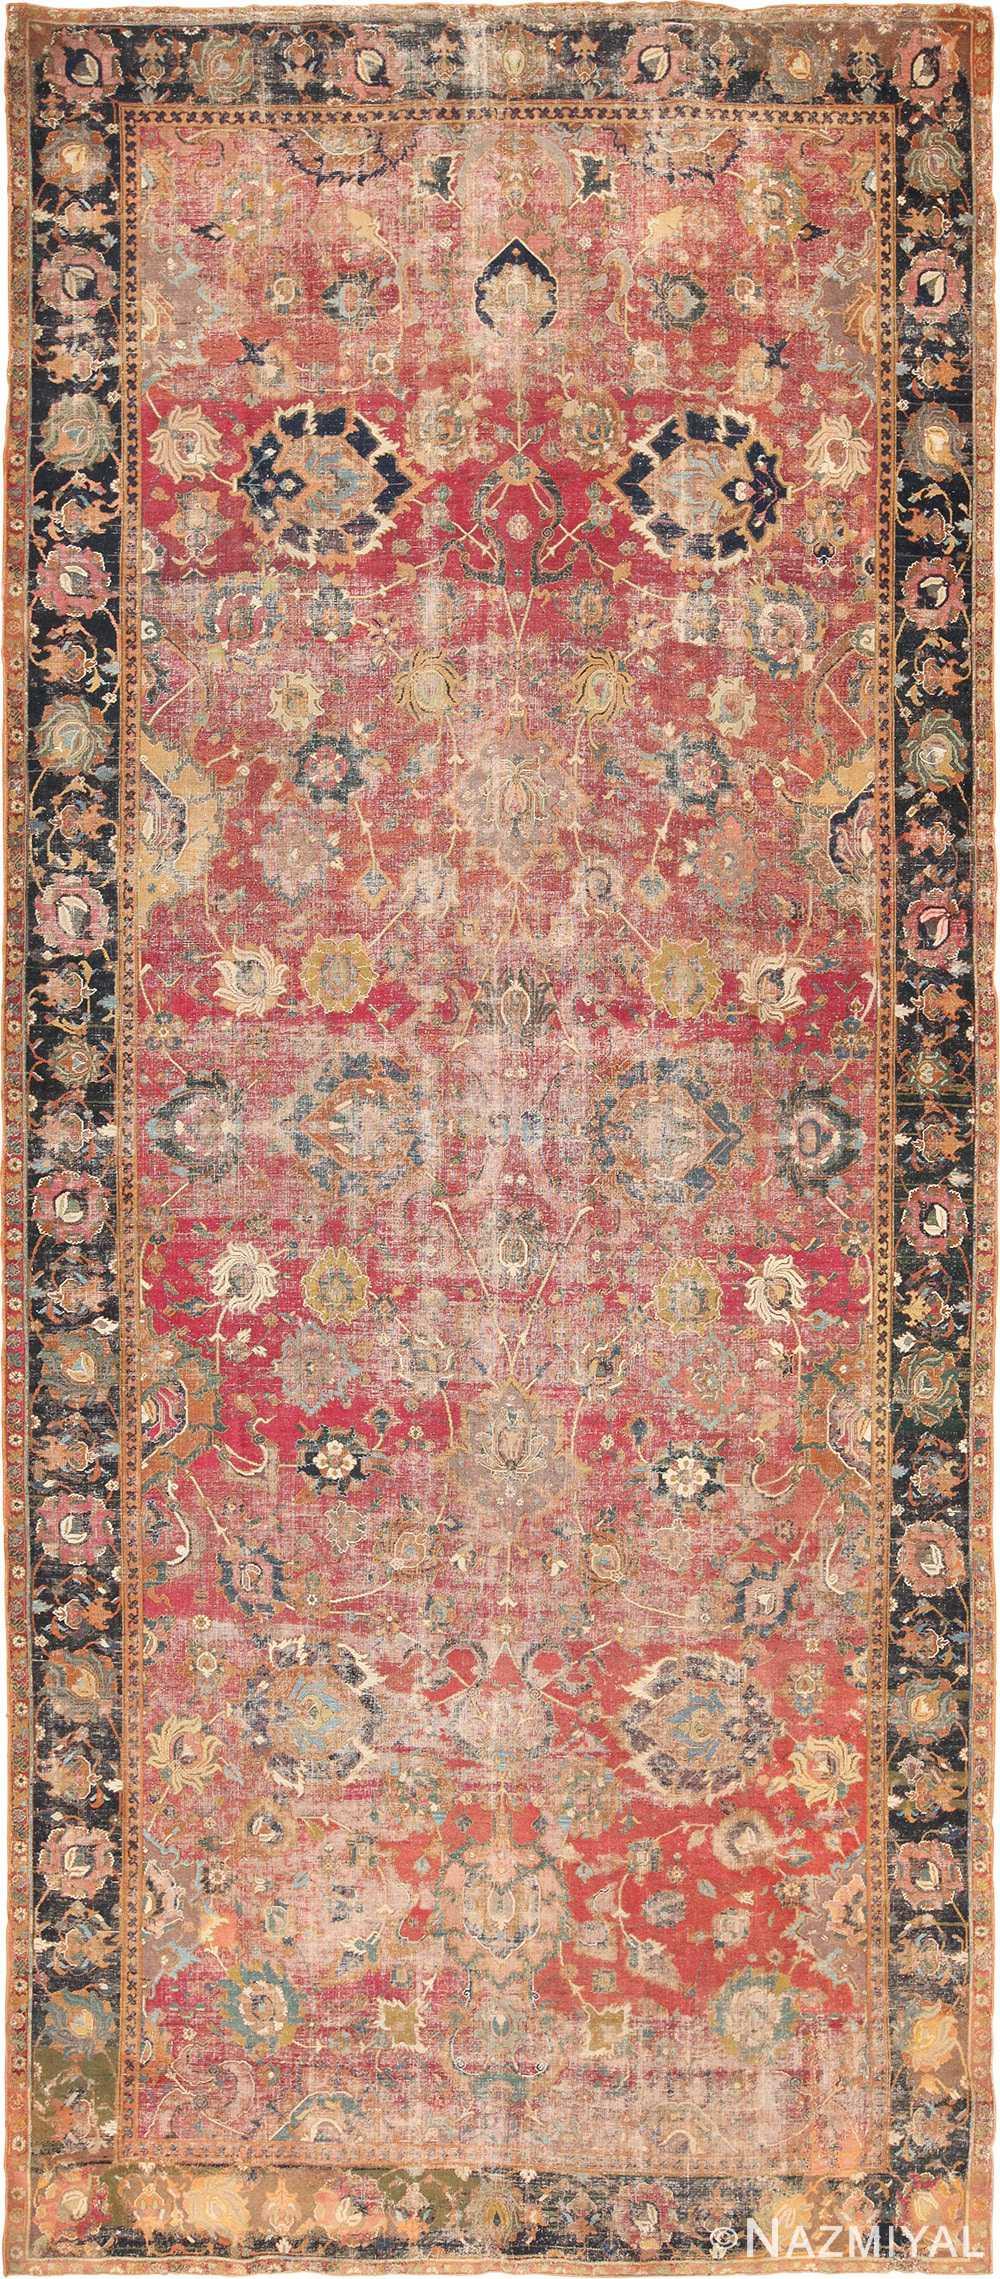 17th Century Wide Hallway Persian Isfahan Rug 49664 Nazmiyal